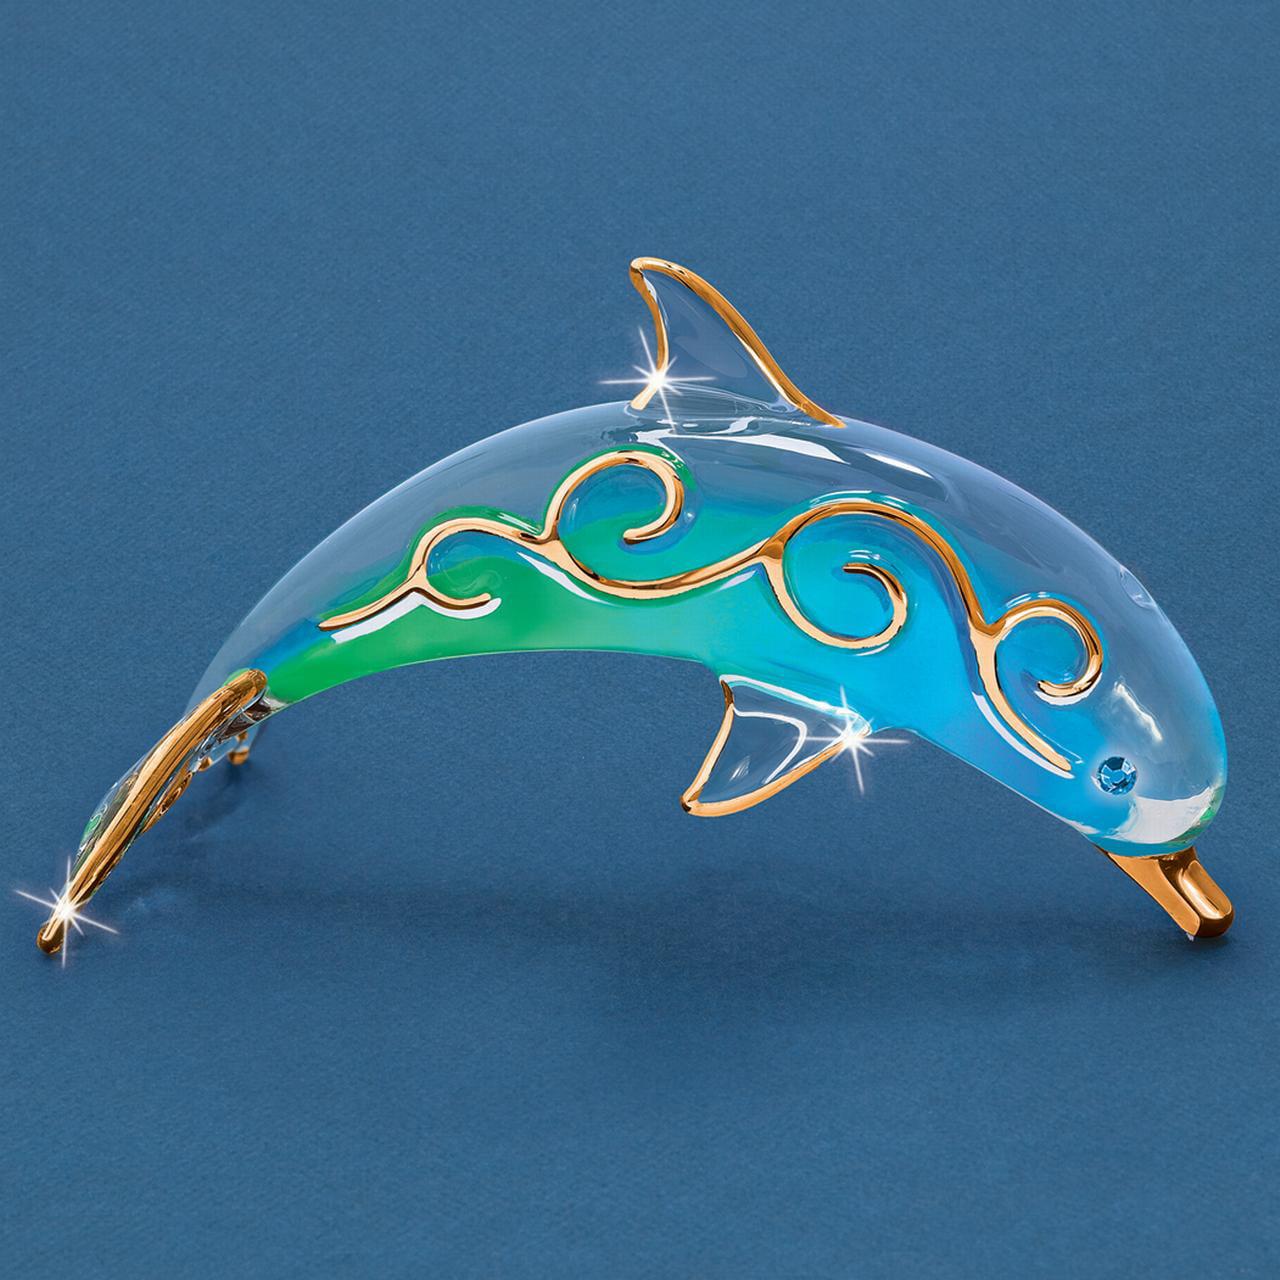 Paradise Dolphin Glass Figurine Floral Garden Nautical Pet Animal Glas Baron For Women